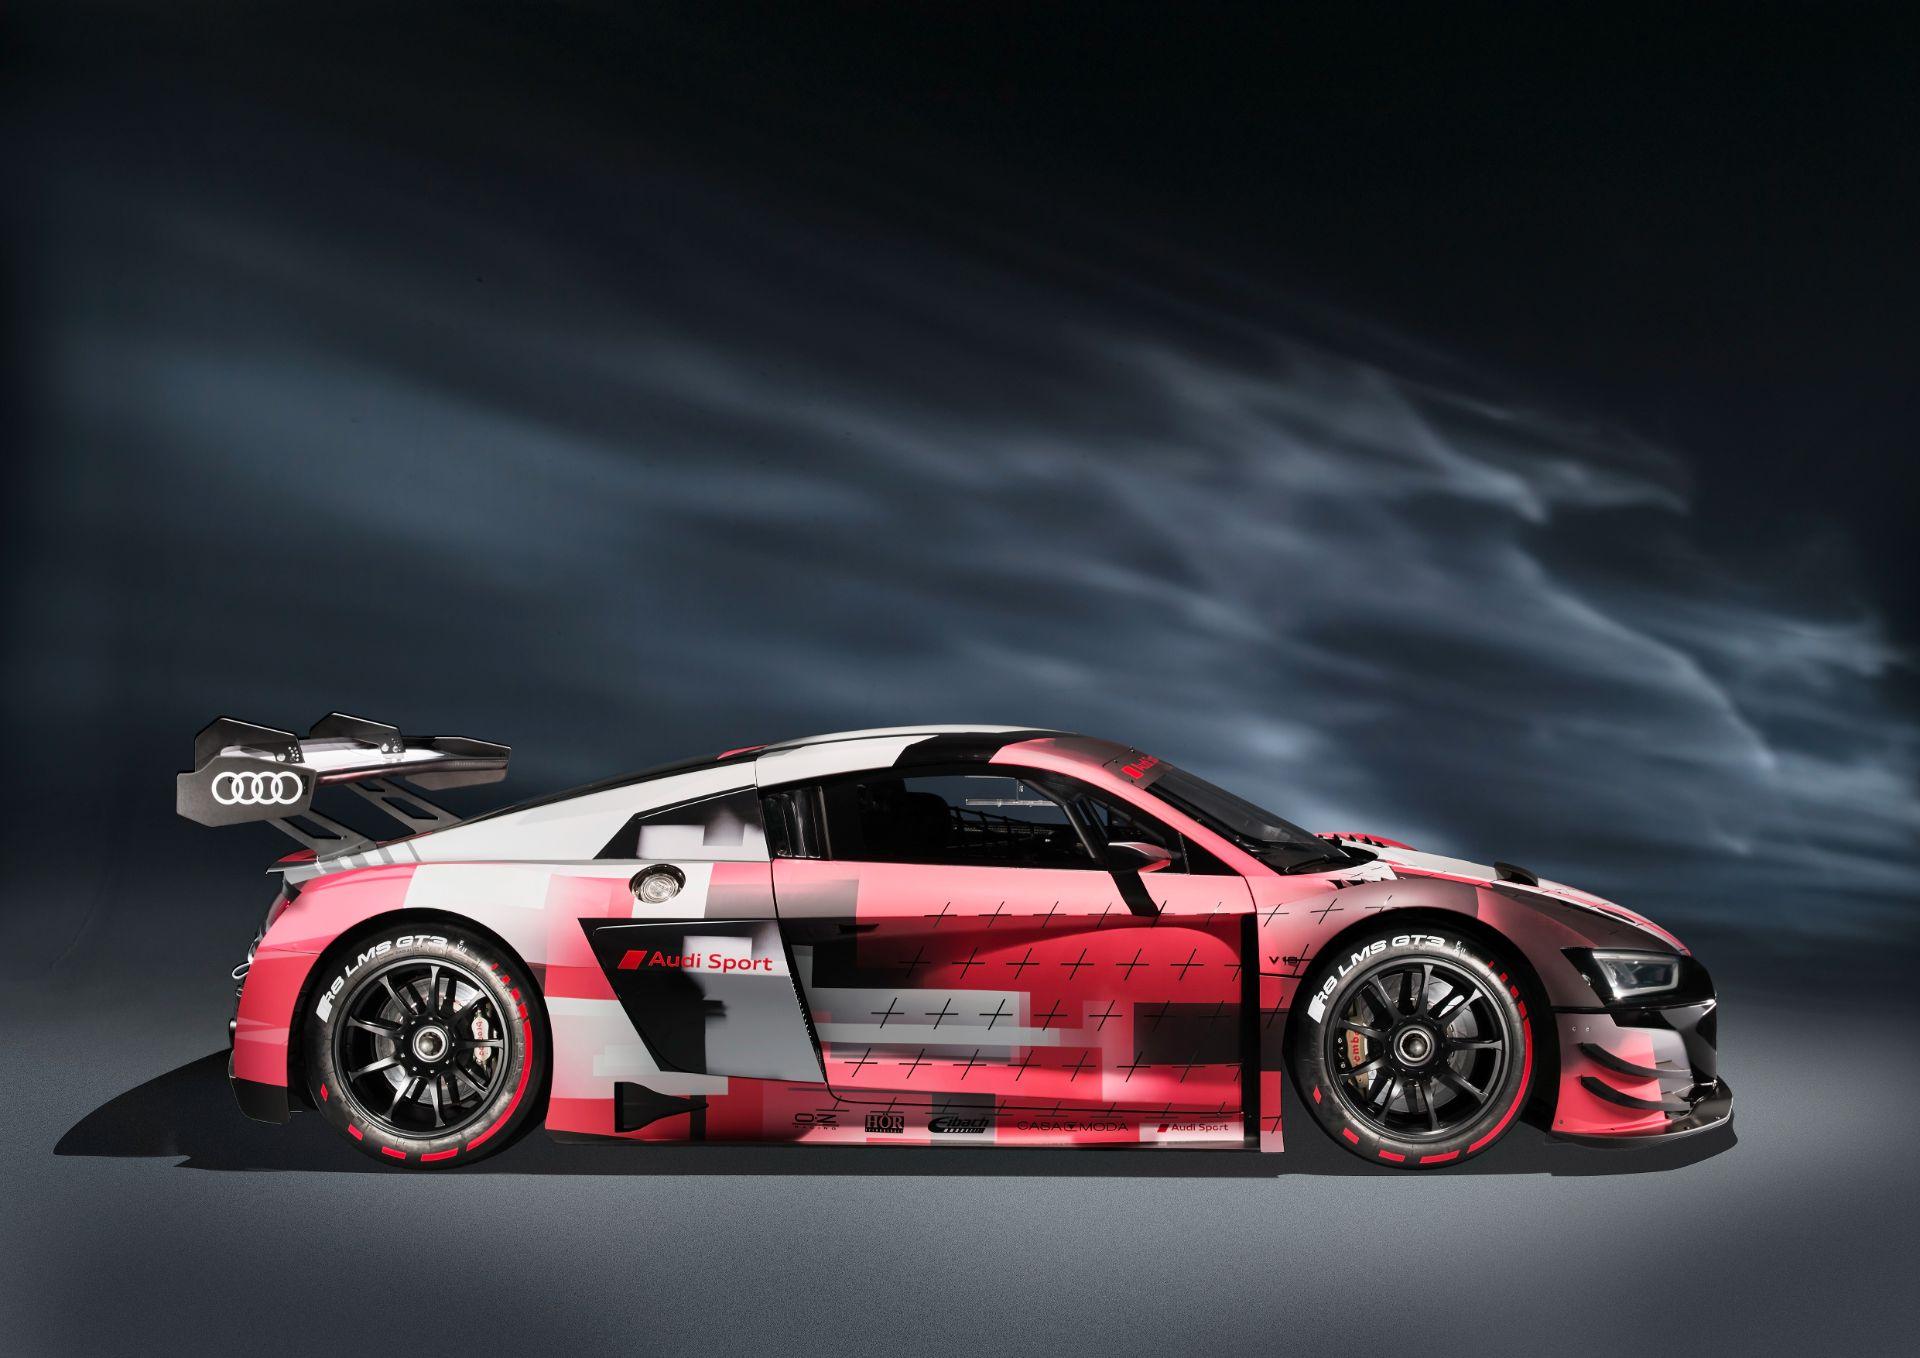 Audi-R8-LMS-GT3-Evo-II-8